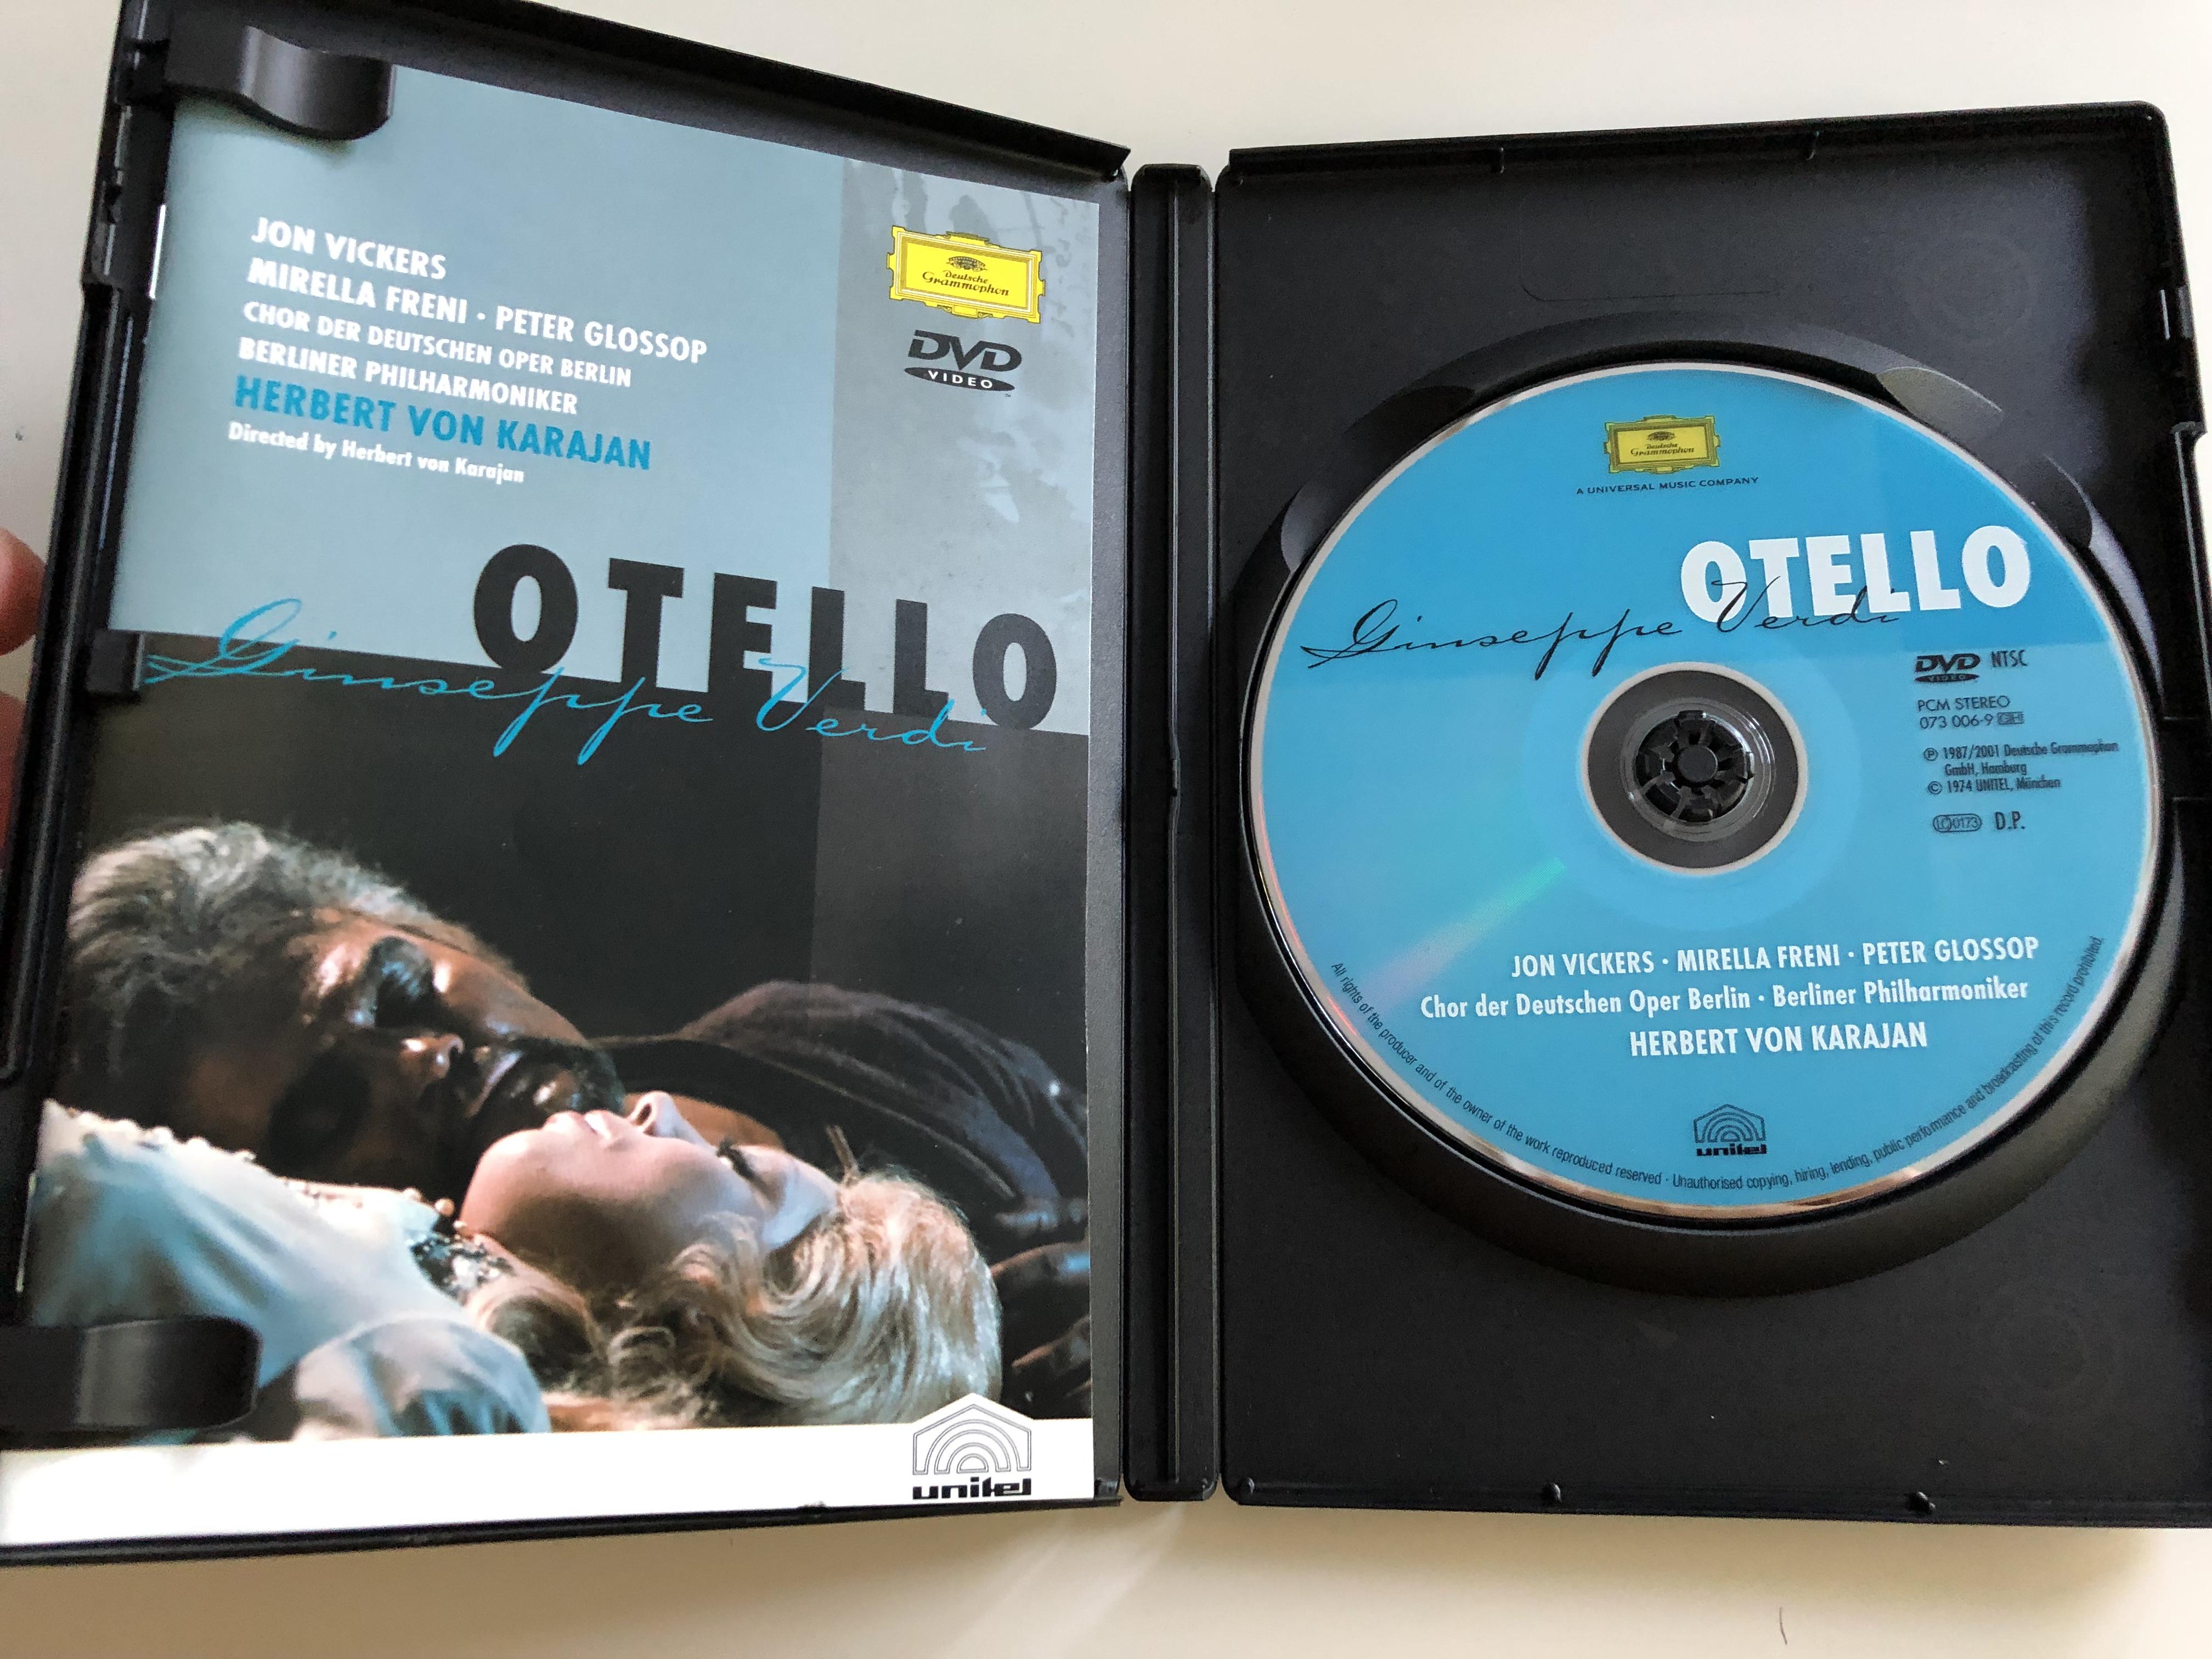 giuseppe-verdi-otello-dvd-2001-jon-vickers-mirella-freni-peter-glossop-berliner-philharmoniker-chor-der-deutschen-oper-berlin-conducted-by-herbert-von-karajan-2-.jpg